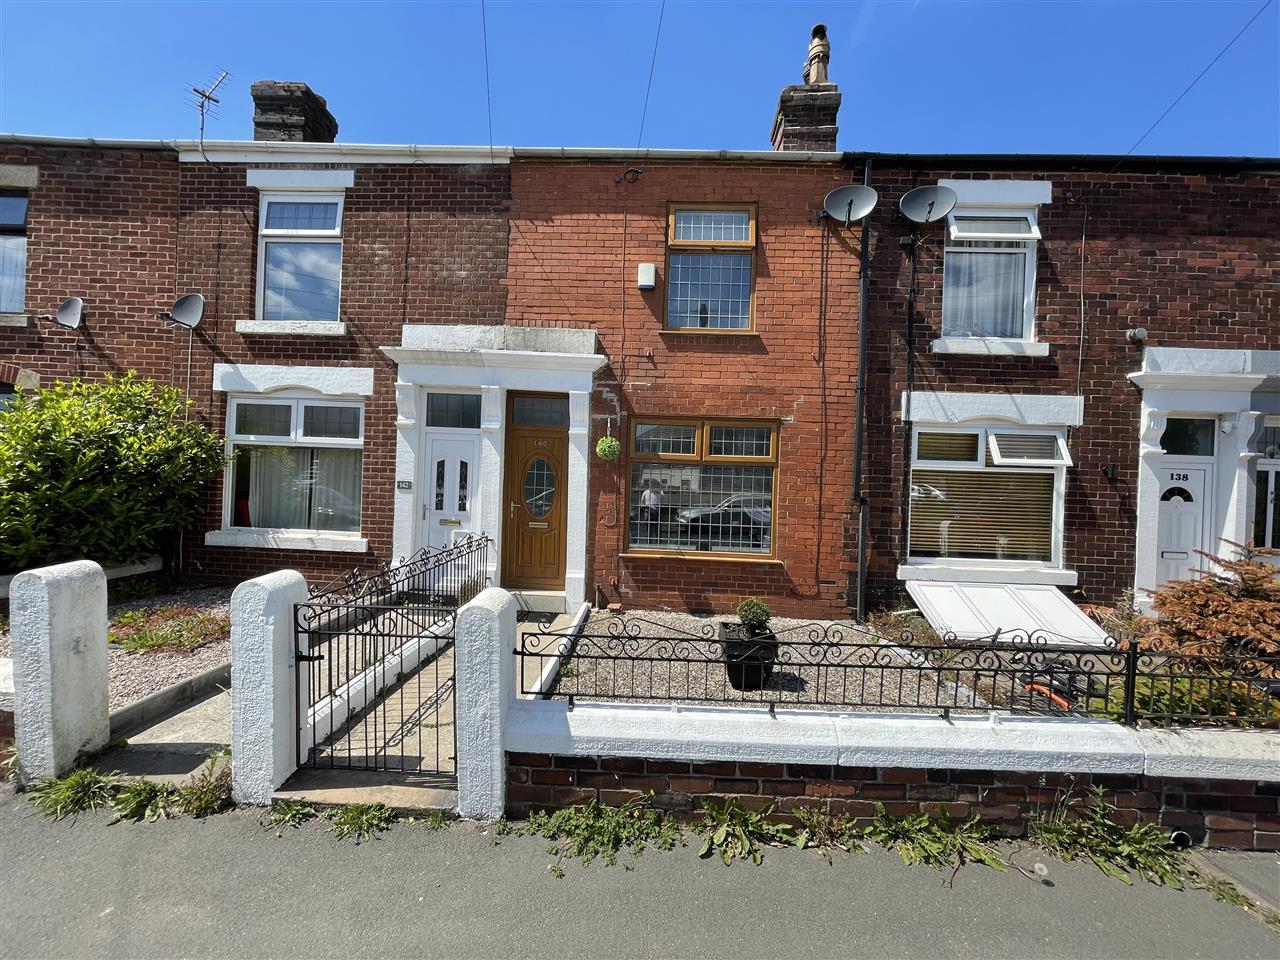 2 bed terraced for sale in Park Road, Adlington, PR7